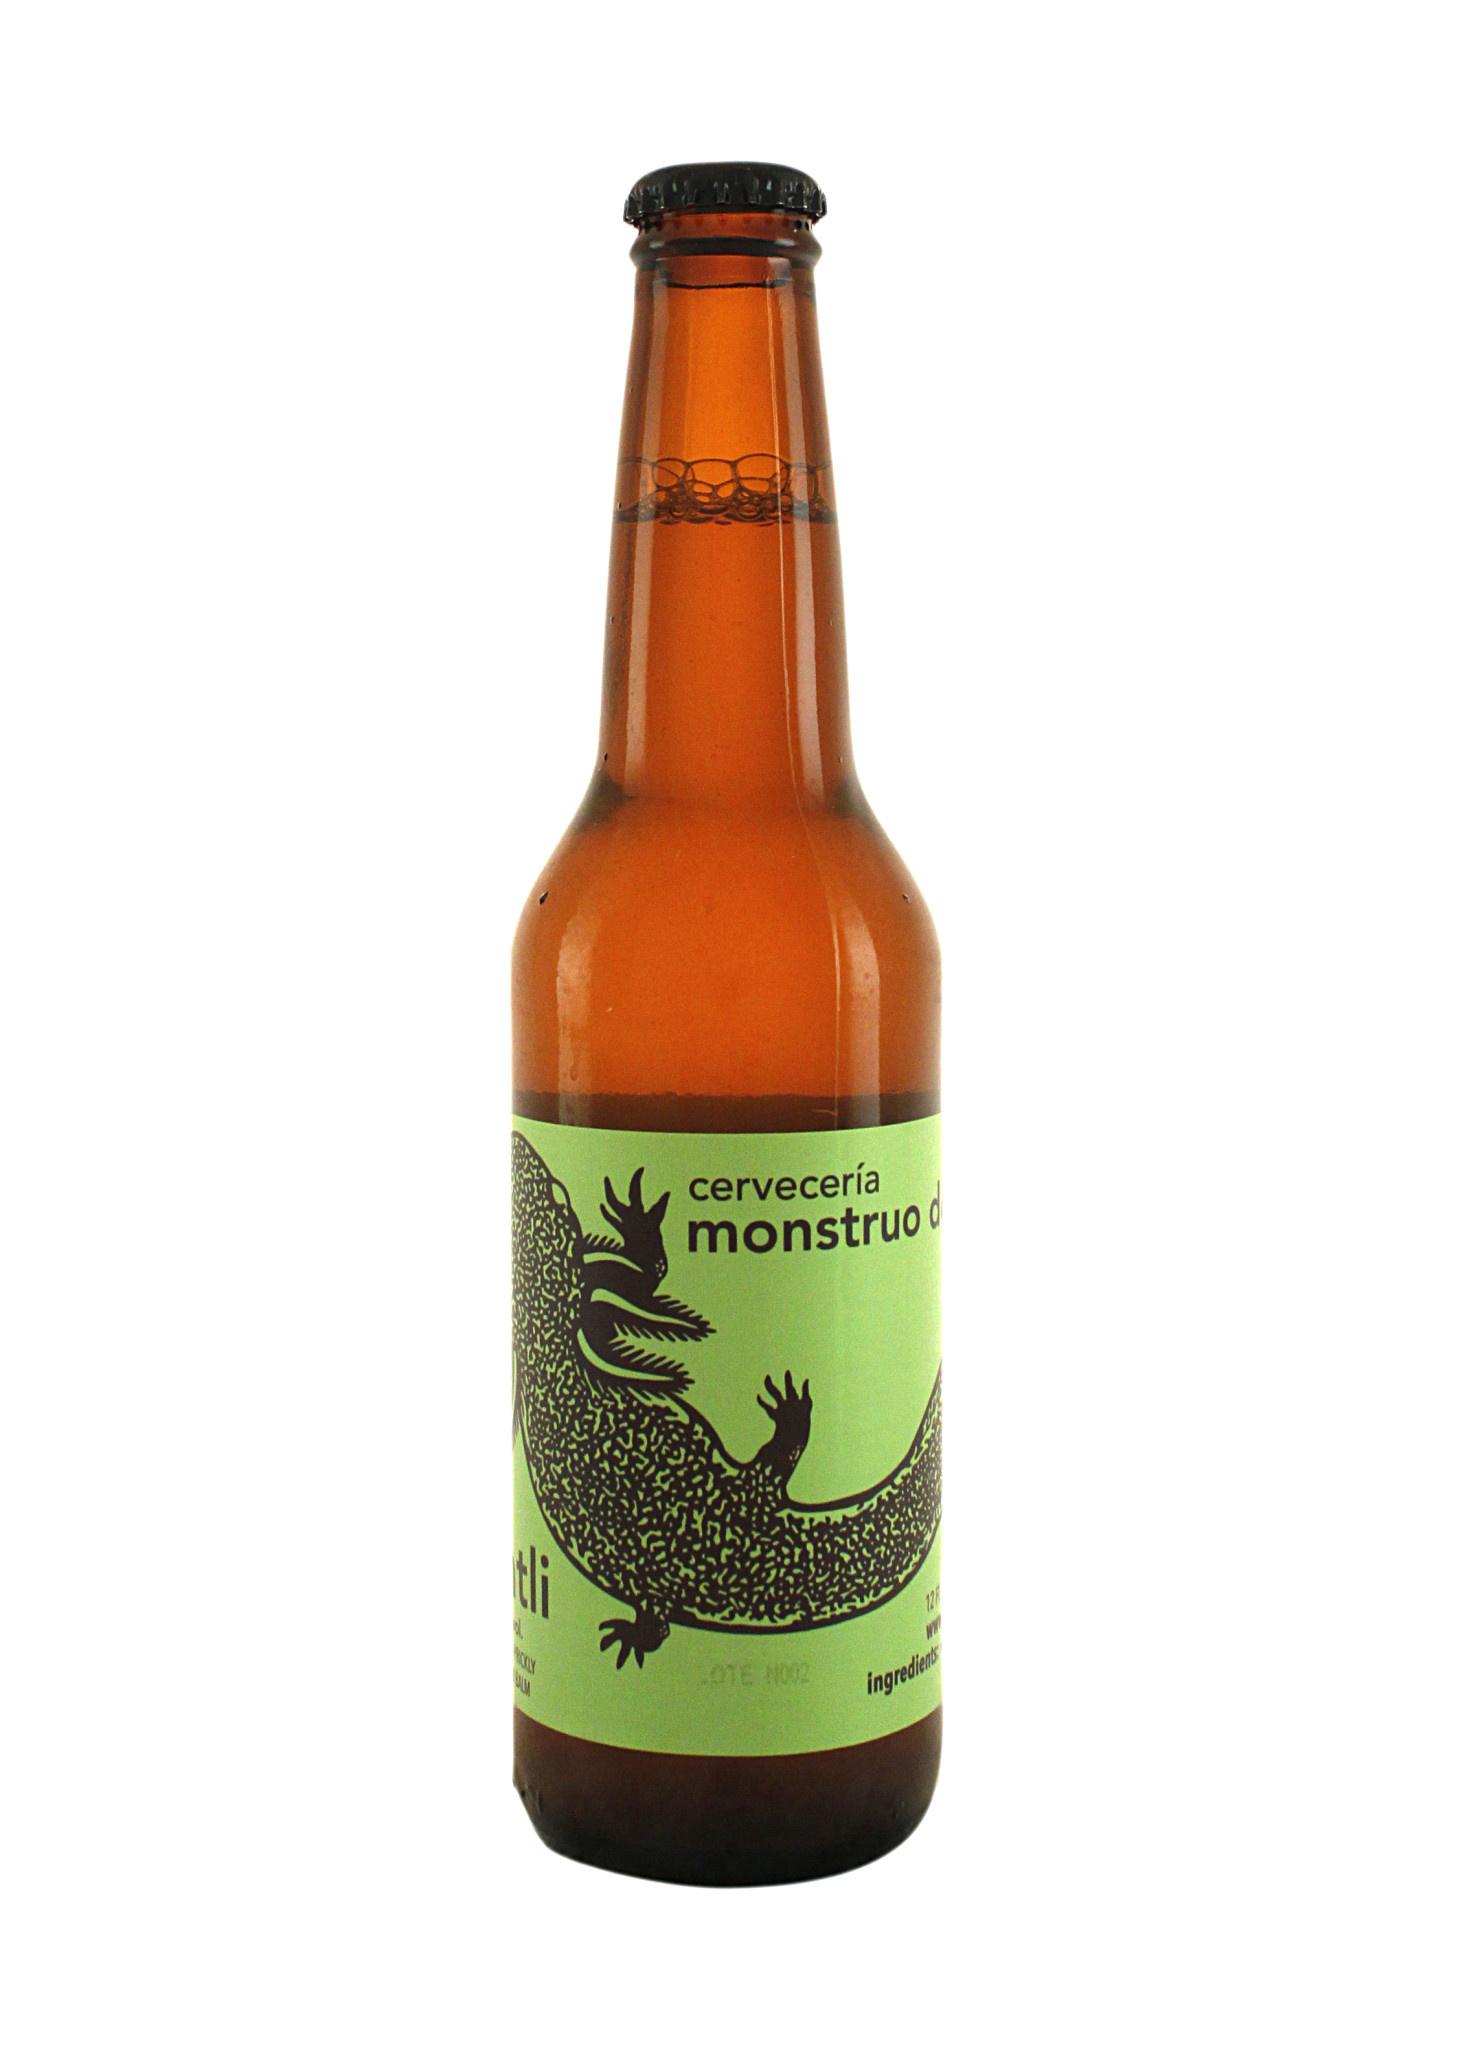 Monstruo de Agua Nochtli Prickly Pear Golden Ale 12oz. bottle - Mexico